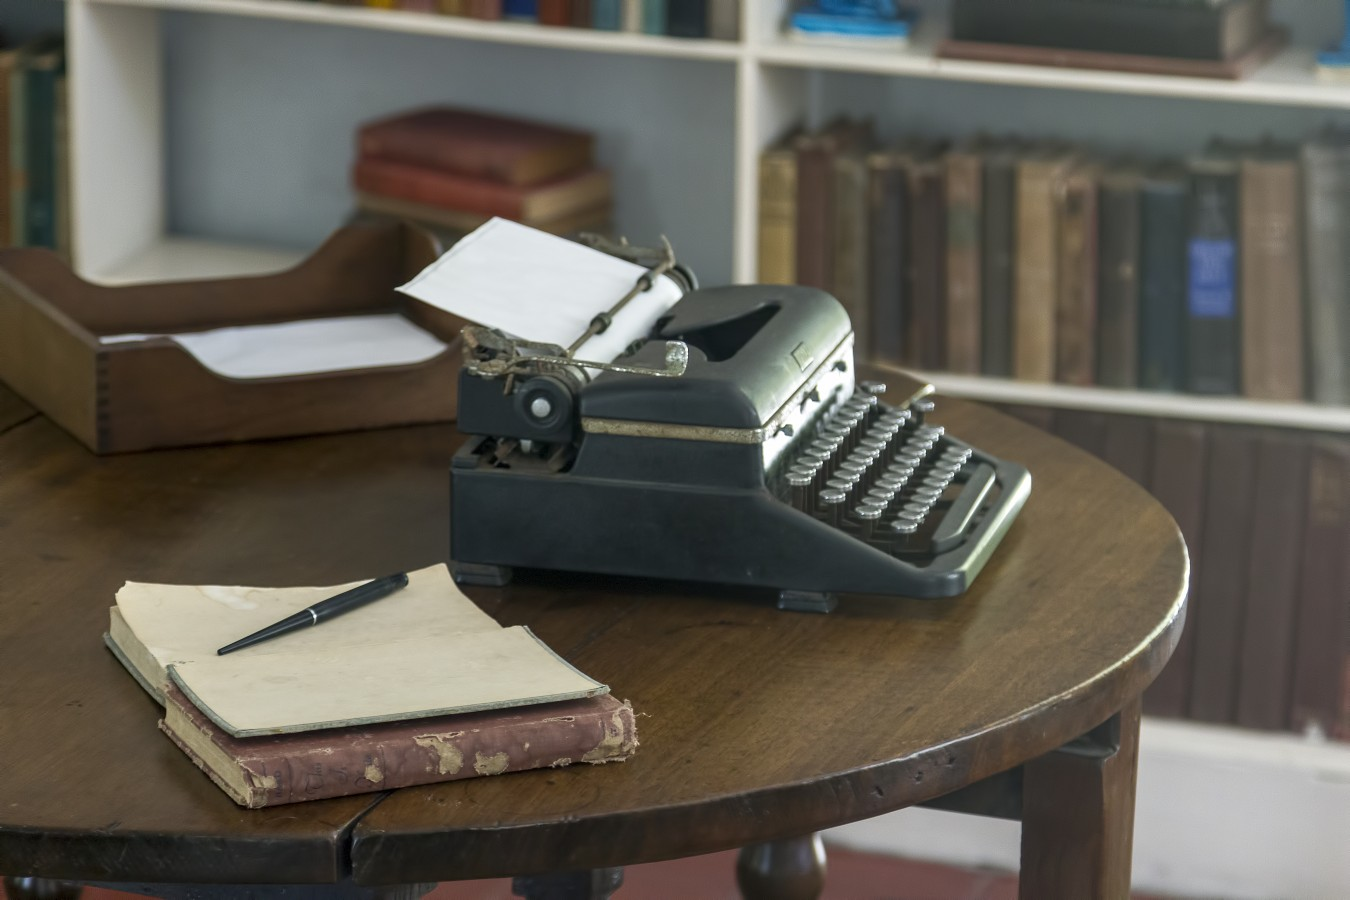 <span style='color:#B00000  ;font-size:14px;'>Filmul săptămânii</span> <br> The Words (Cuvintele)</p>